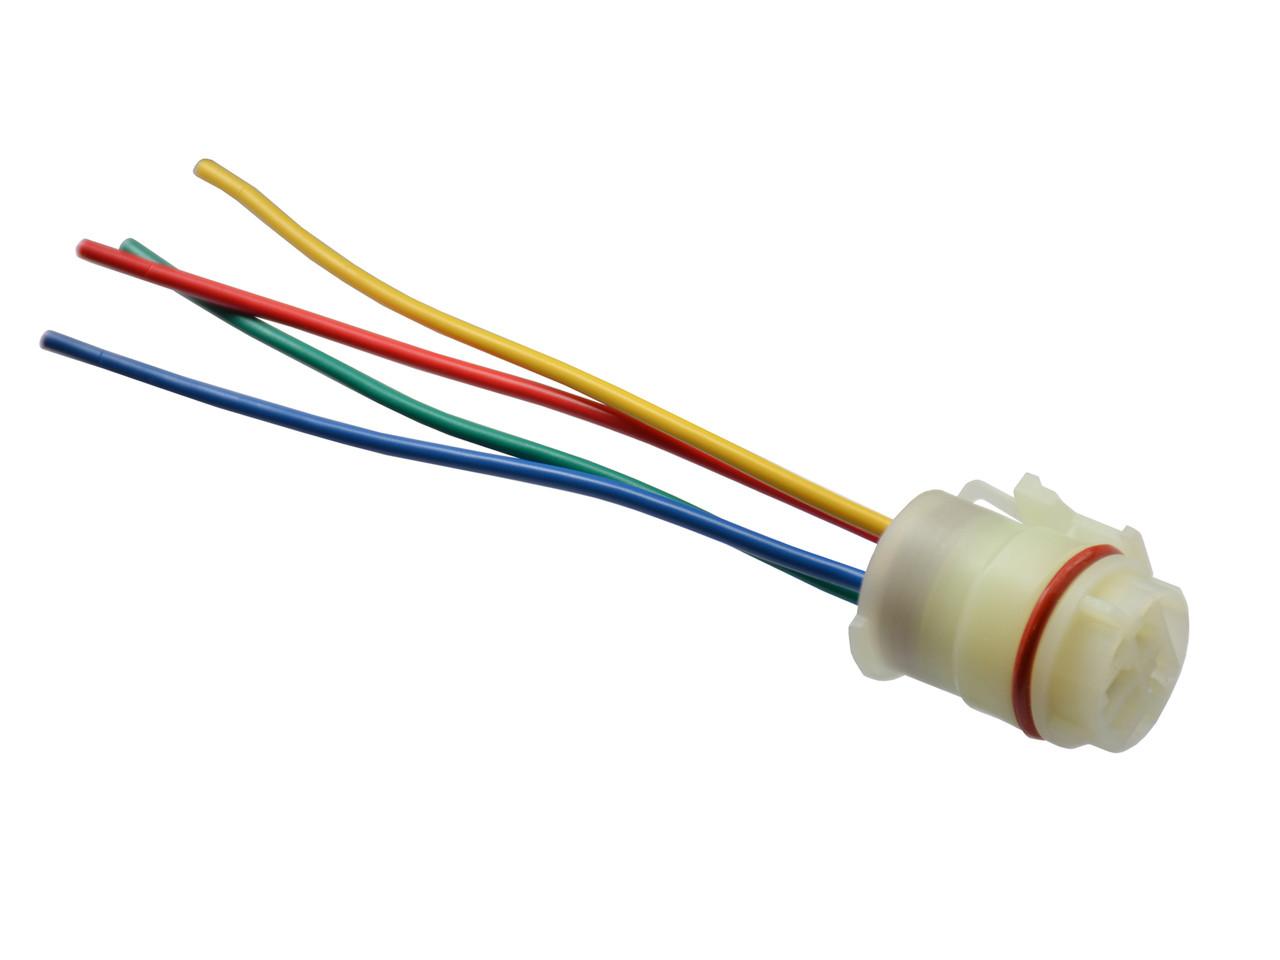 hight resolution of alternator repair plug harness connector fits hitachi isuzu rodeo honda passport 2 6l